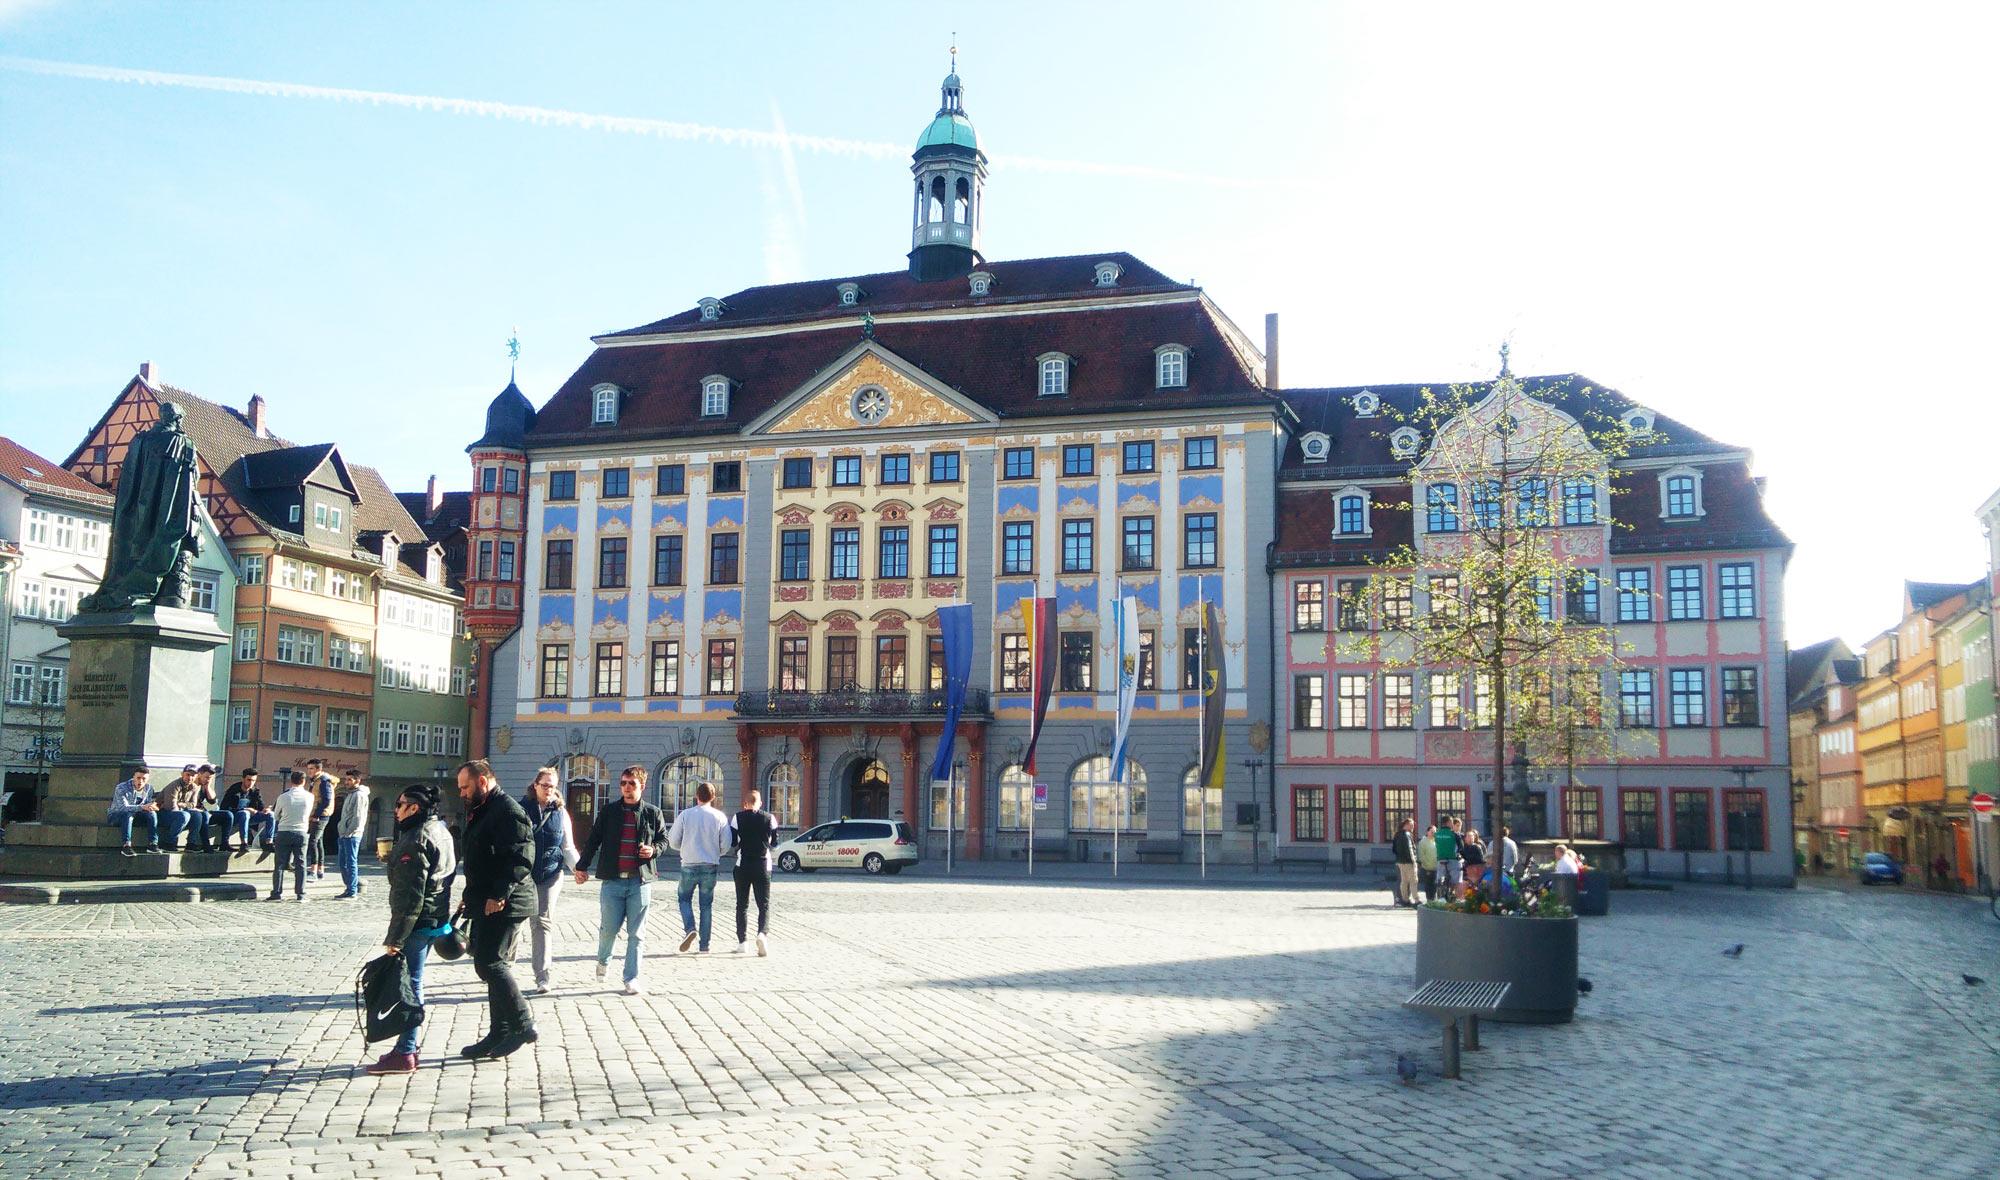 representive Renaissance town hall in Coburg